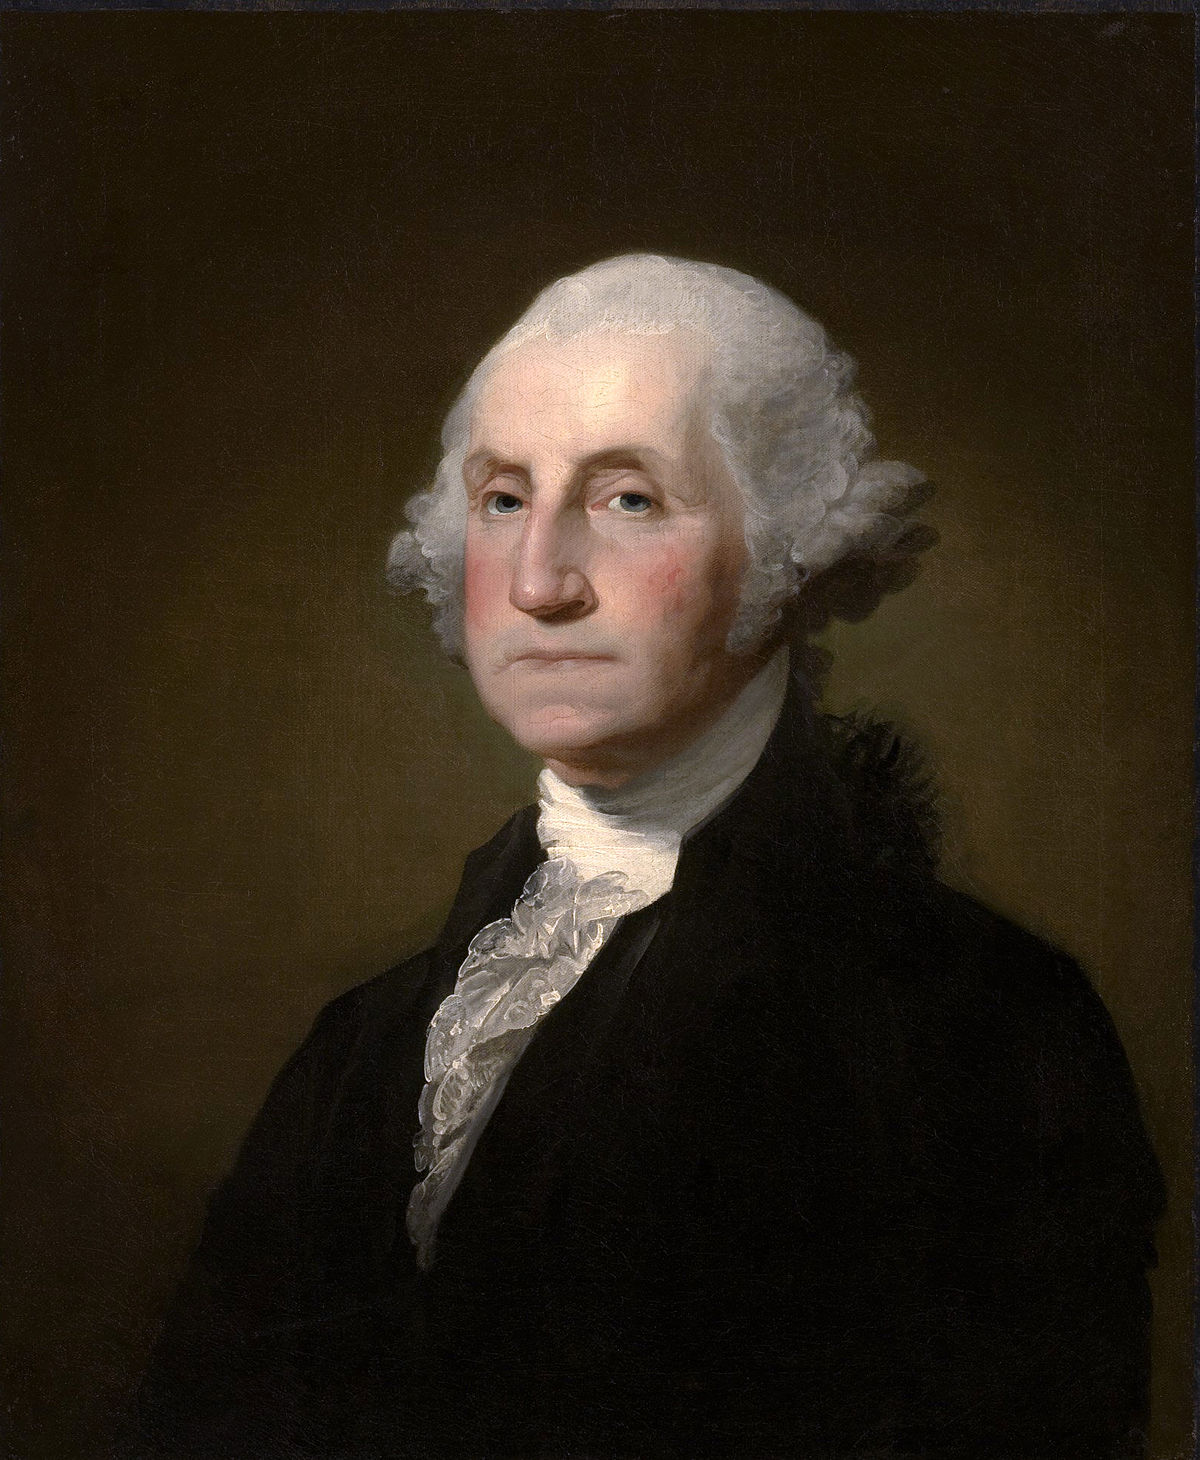 George Washington (portrait).jpg